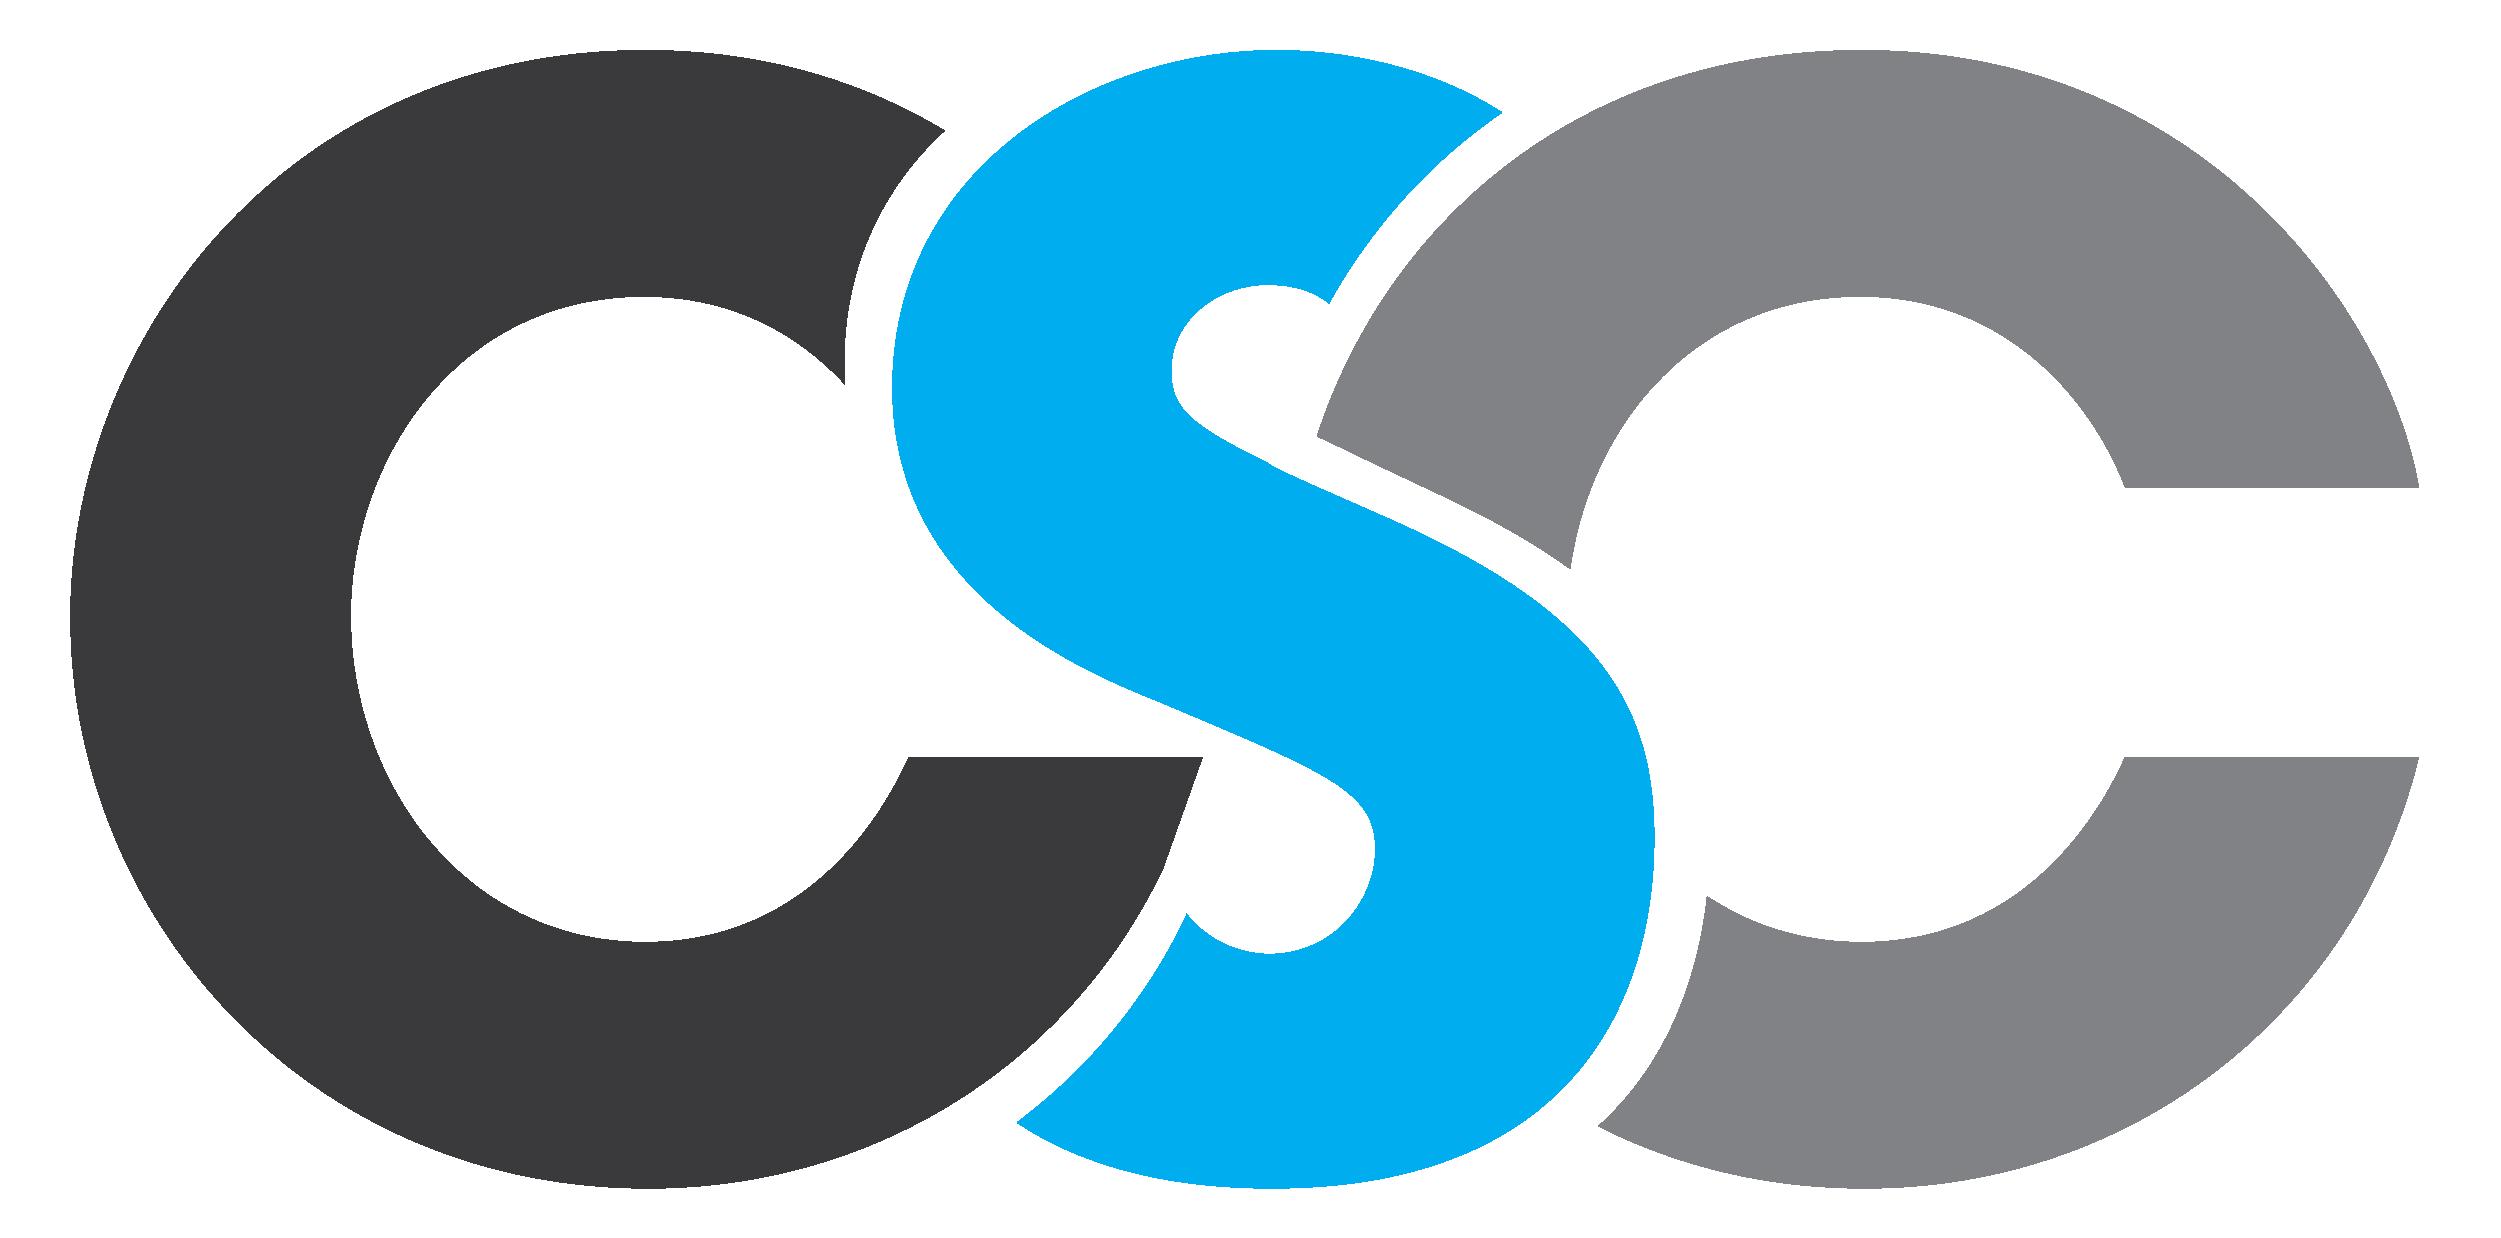 Customized Service Concepts, LLC